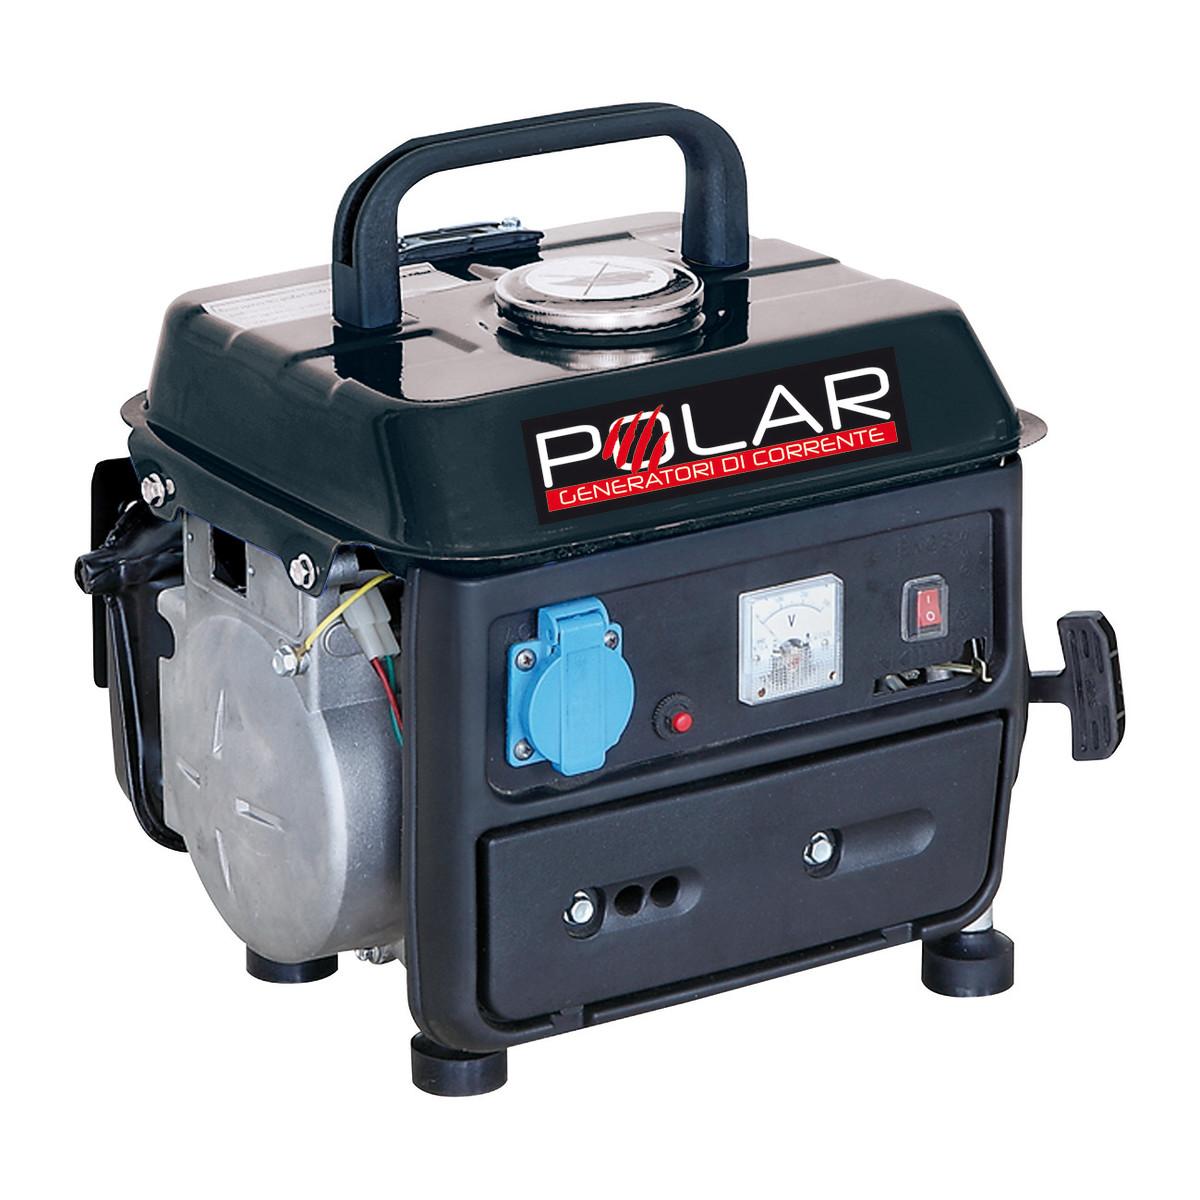 Polar generatore corrente polar 2 kw prezzo e offerte for Generatore hyundai leroy merlin